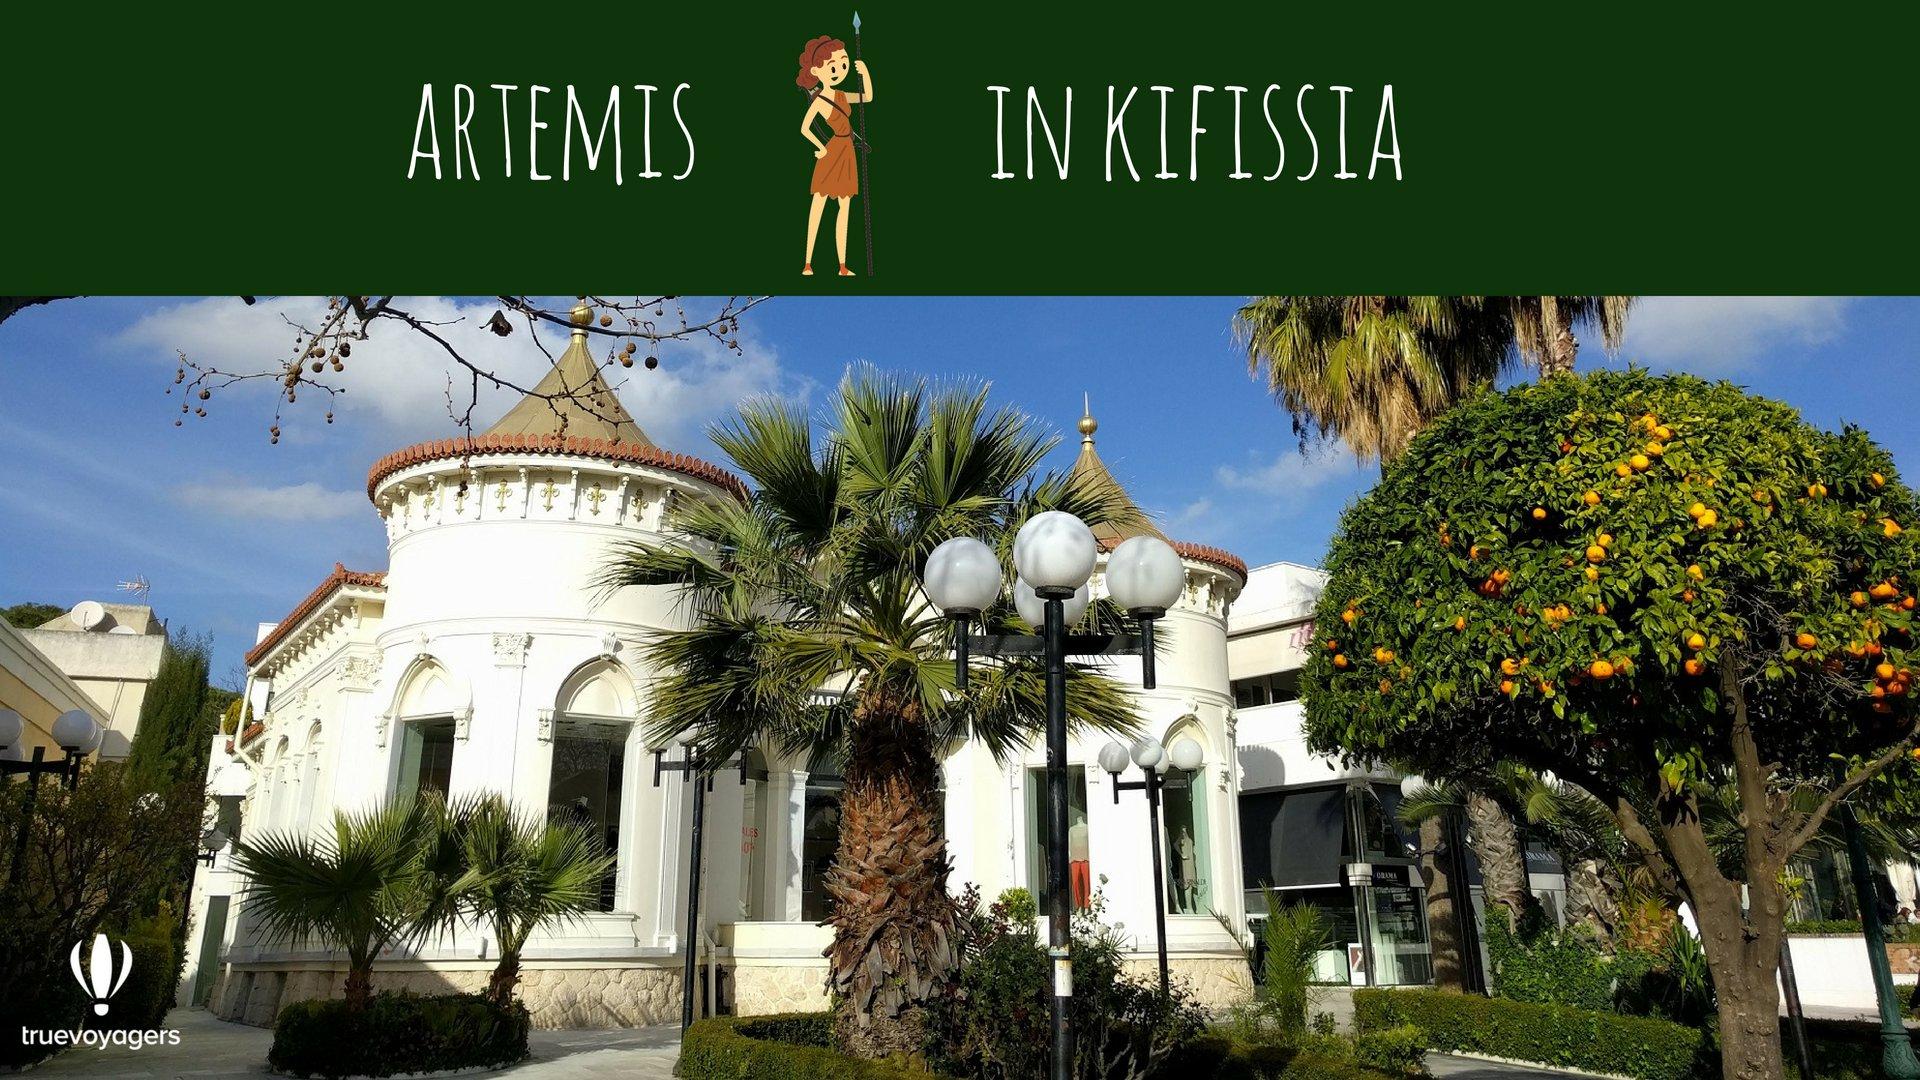 Artemis in Kifissia. Copyright: Truevoyagers